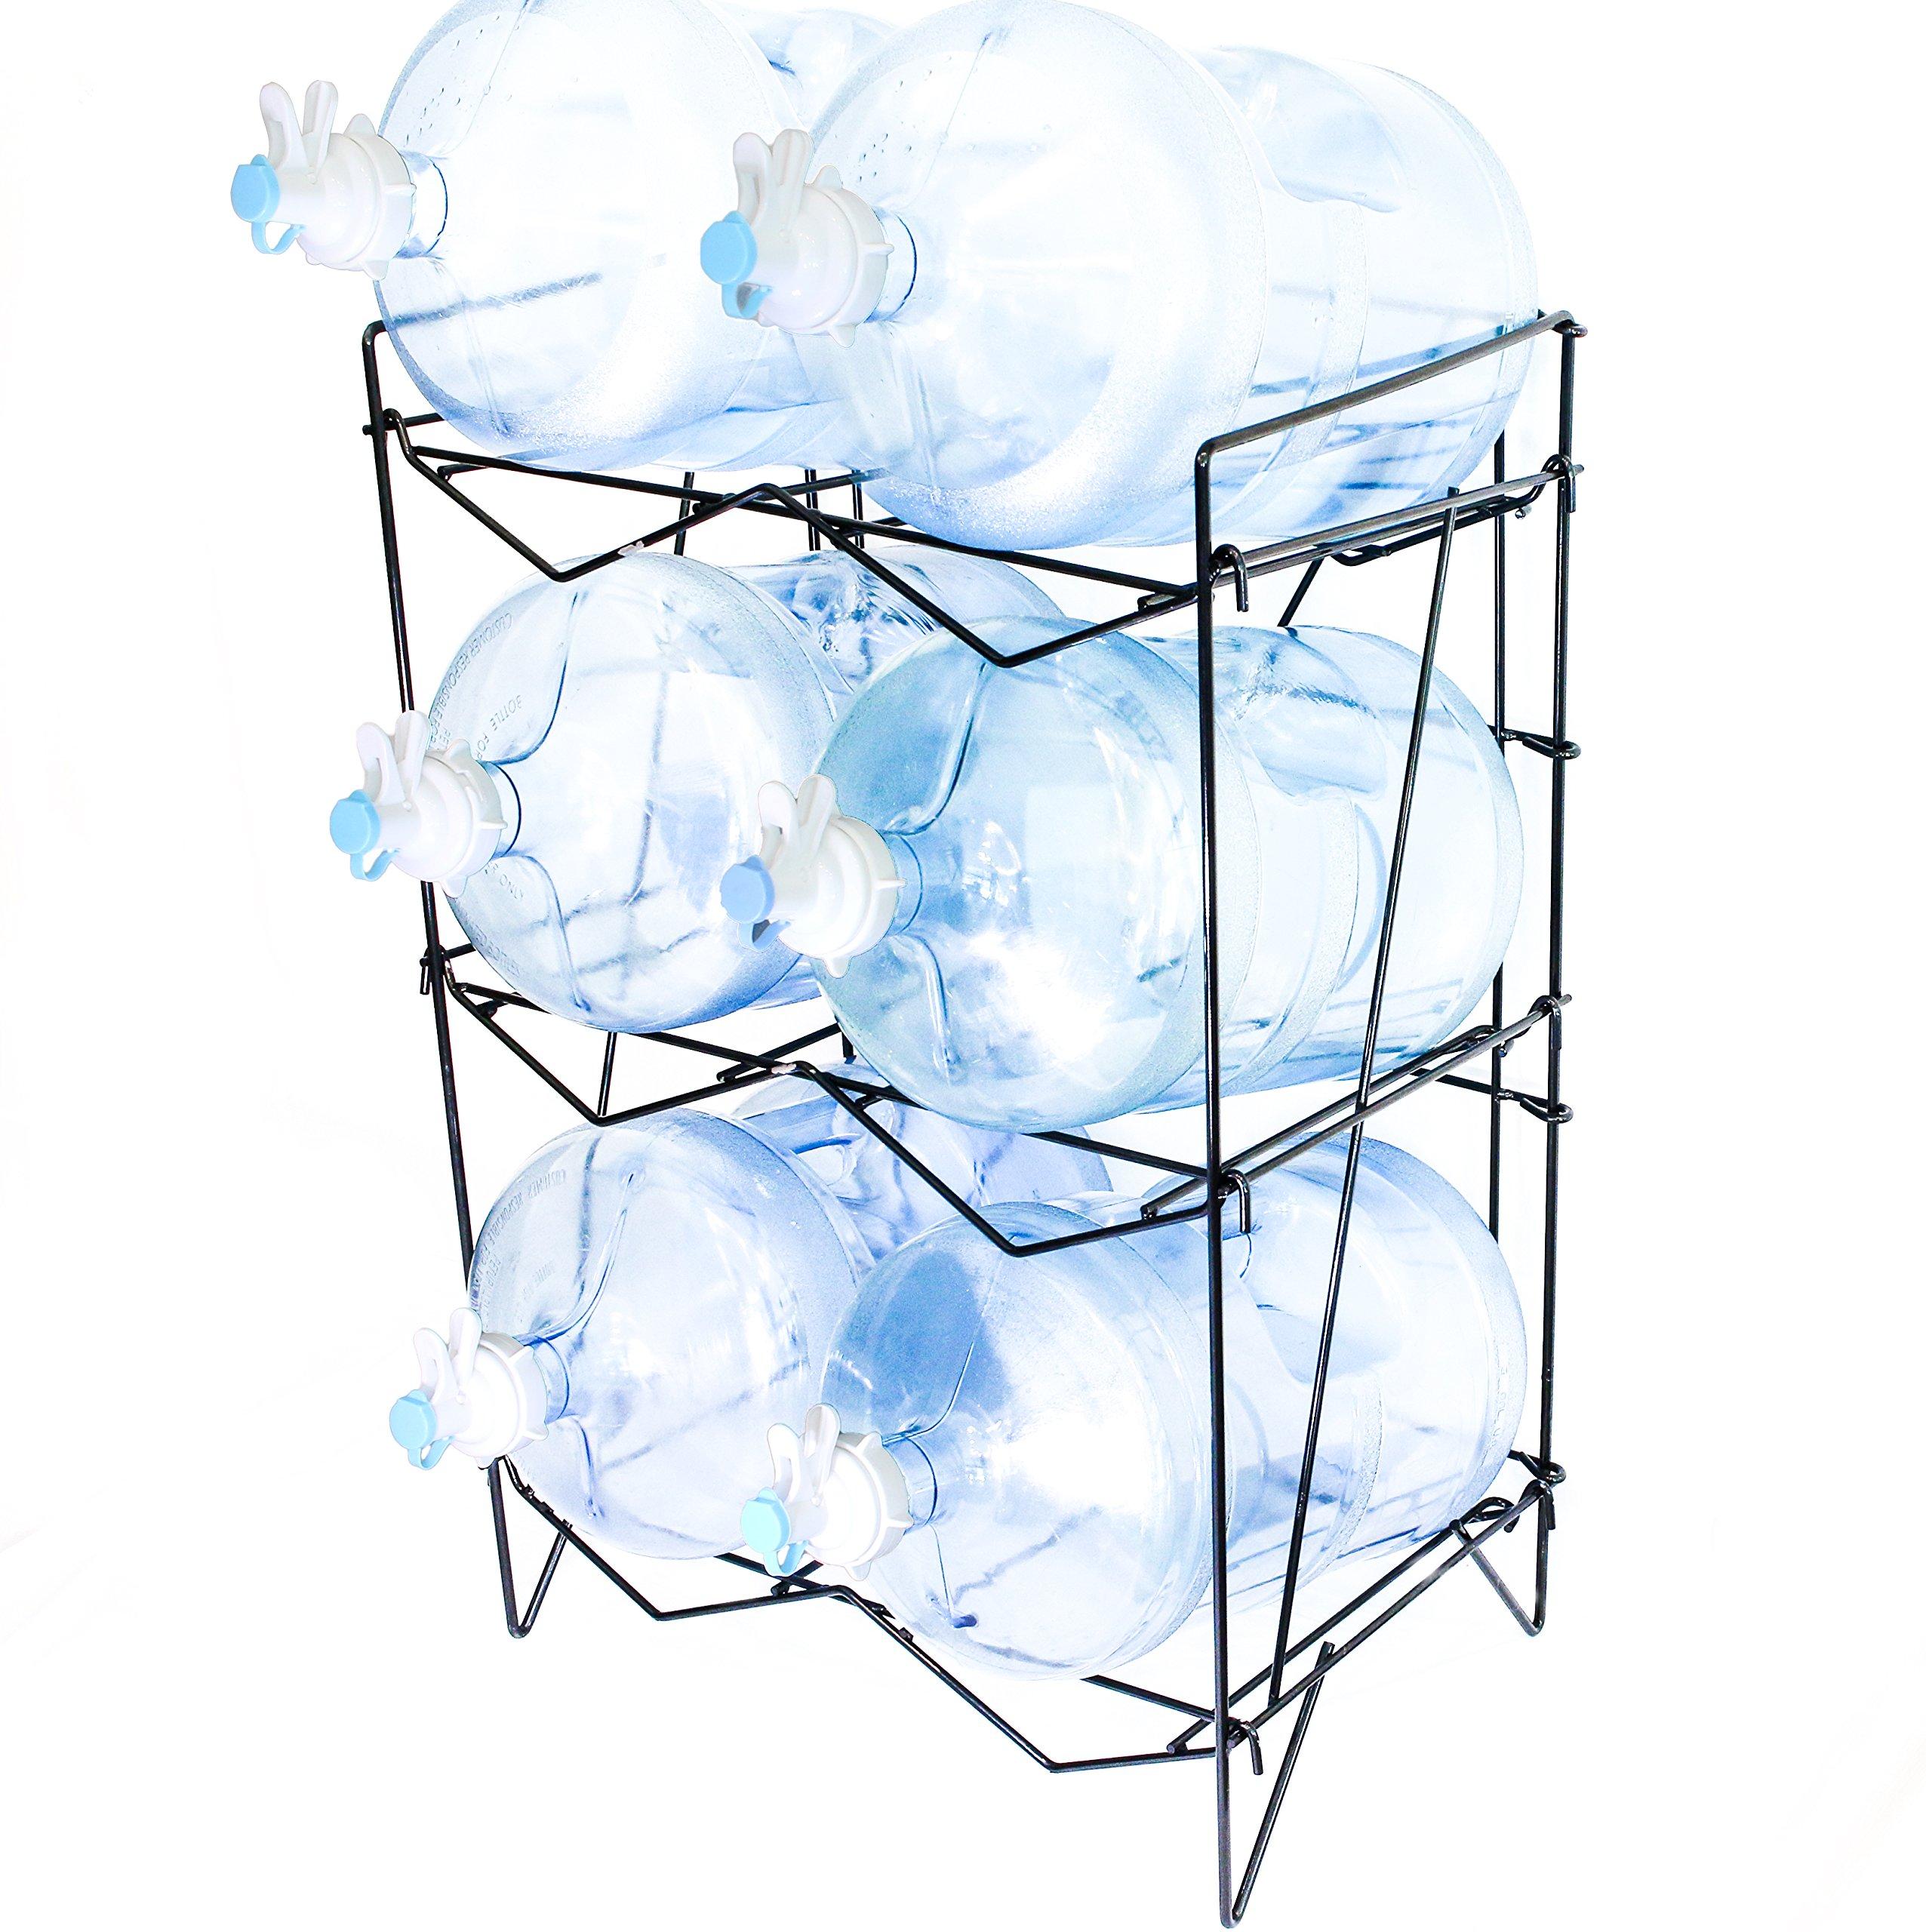 Water Bottle Storage: 5 Gallon Water Bottle Rack Holder Durable Stainless Steel